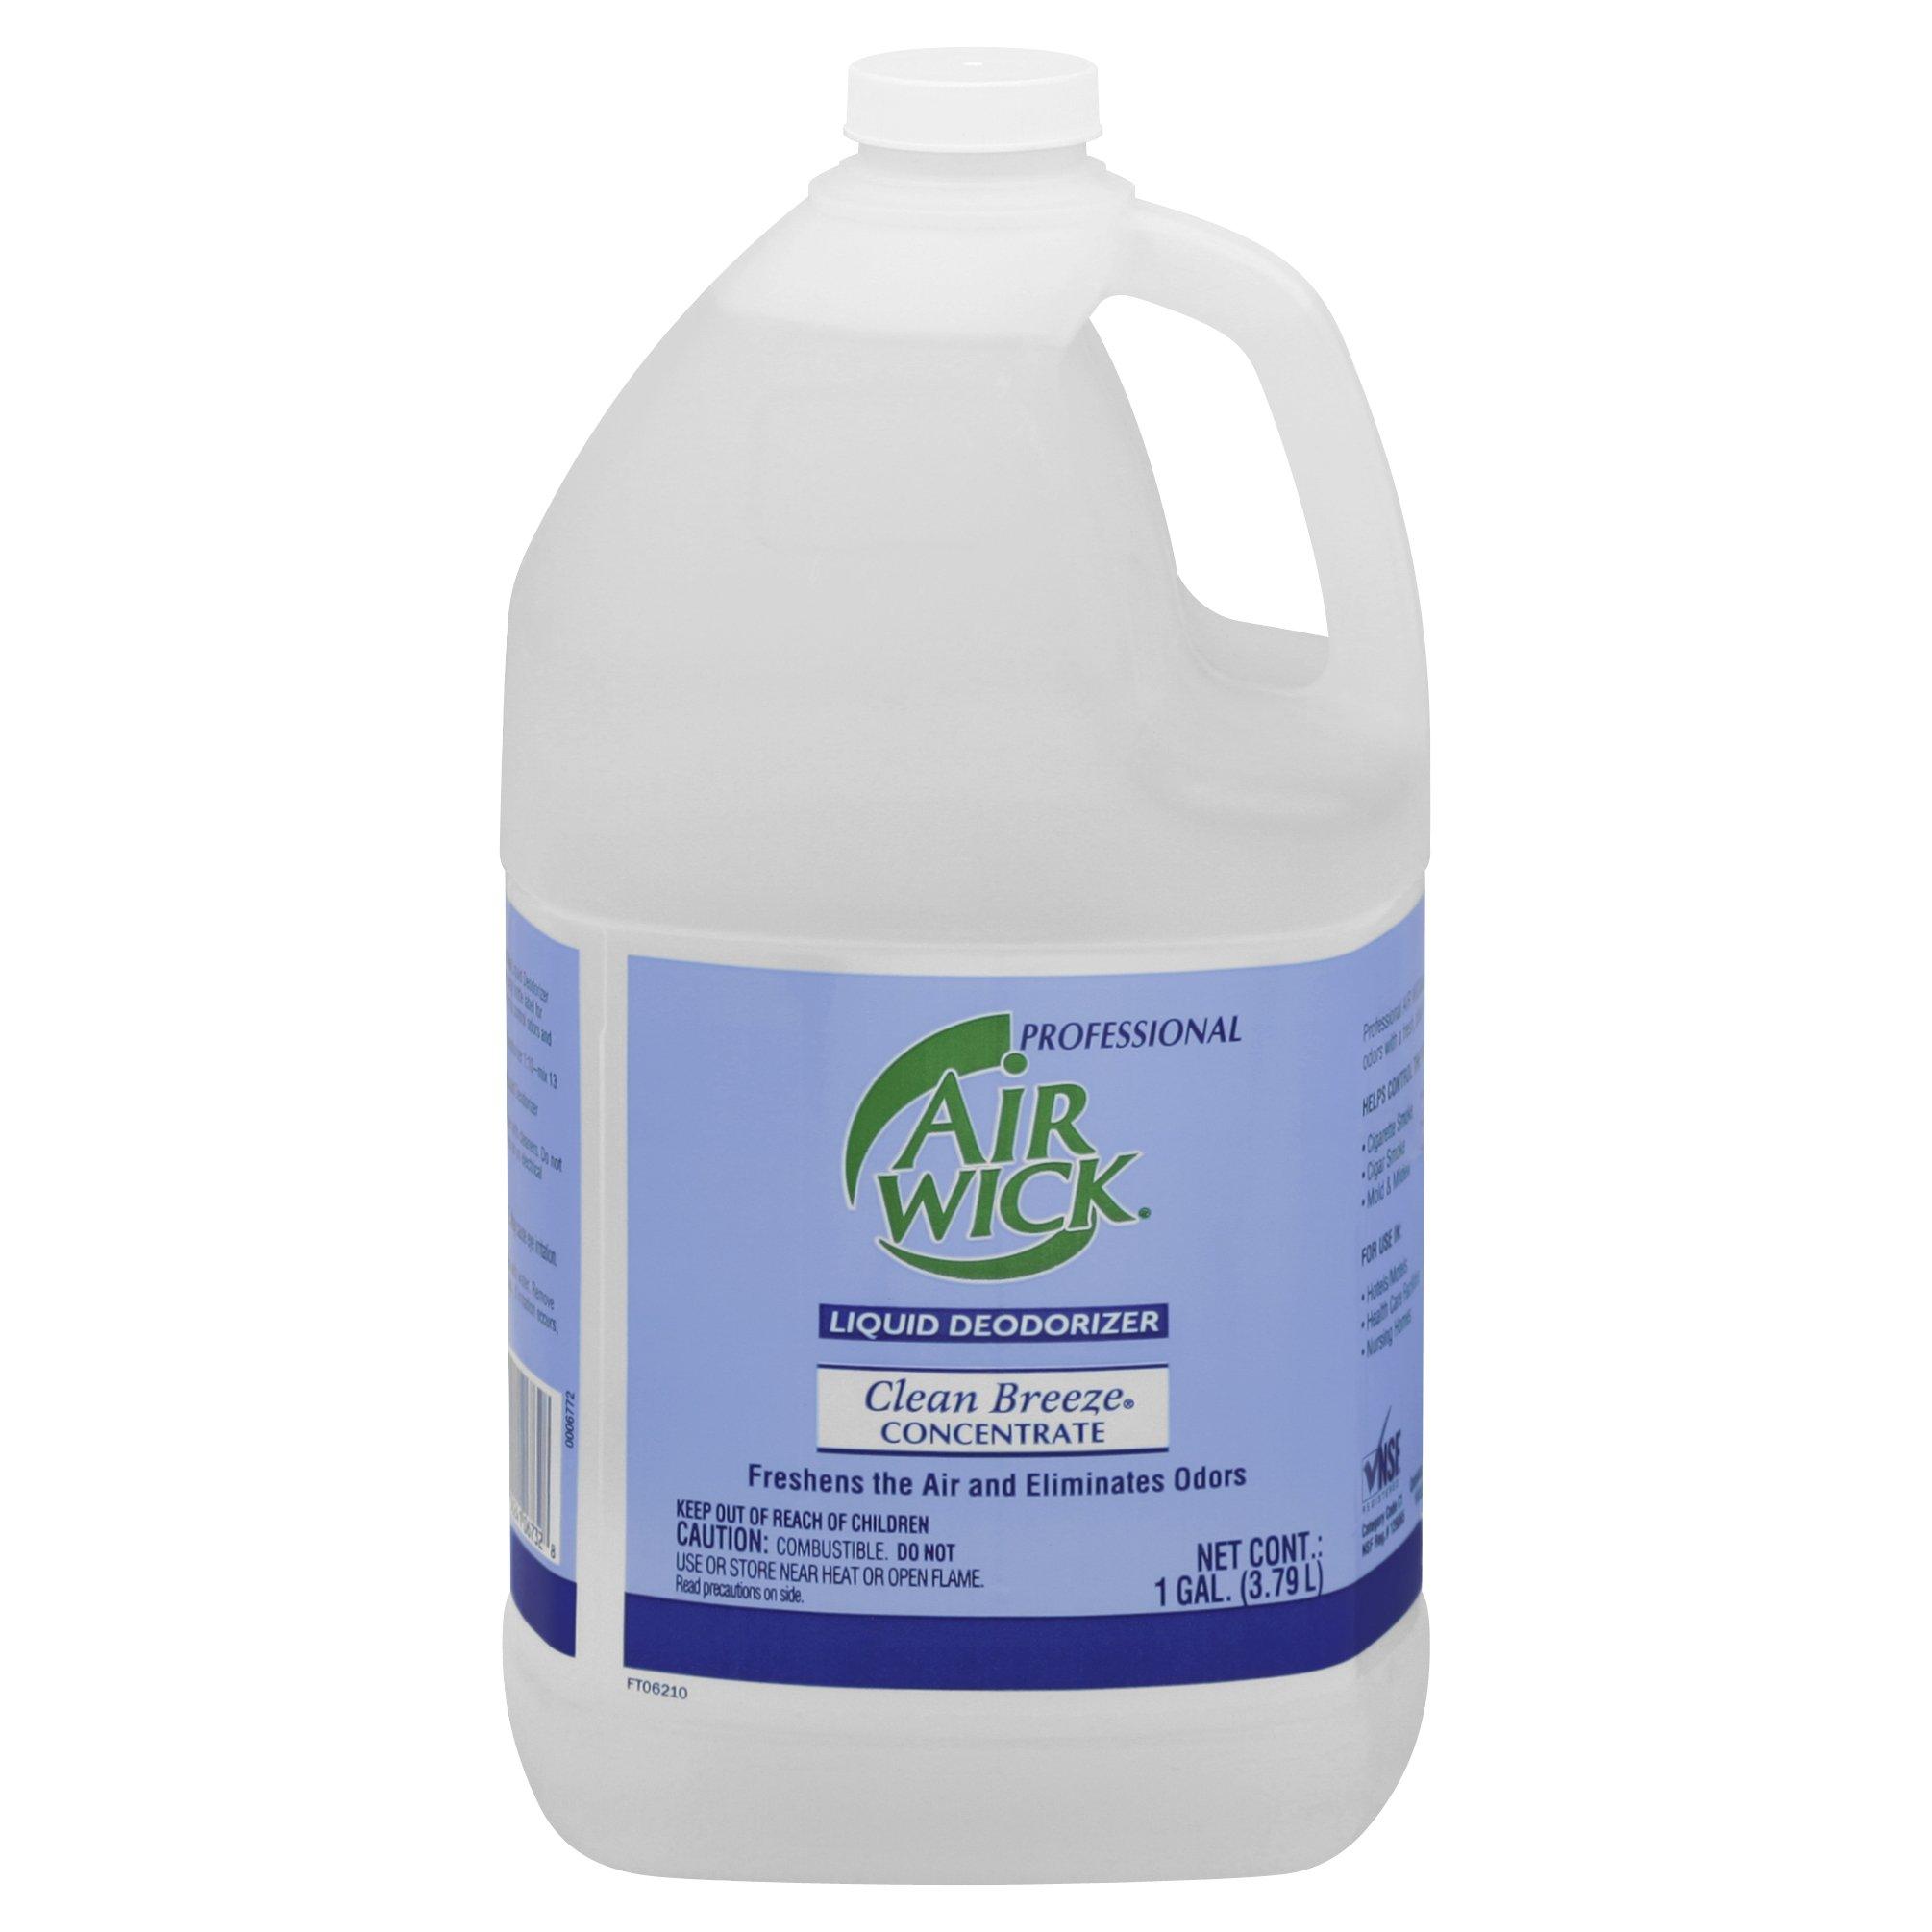 Air Wick Professional Liquid Deodorizer, Clean Breeze, 128 Ounce